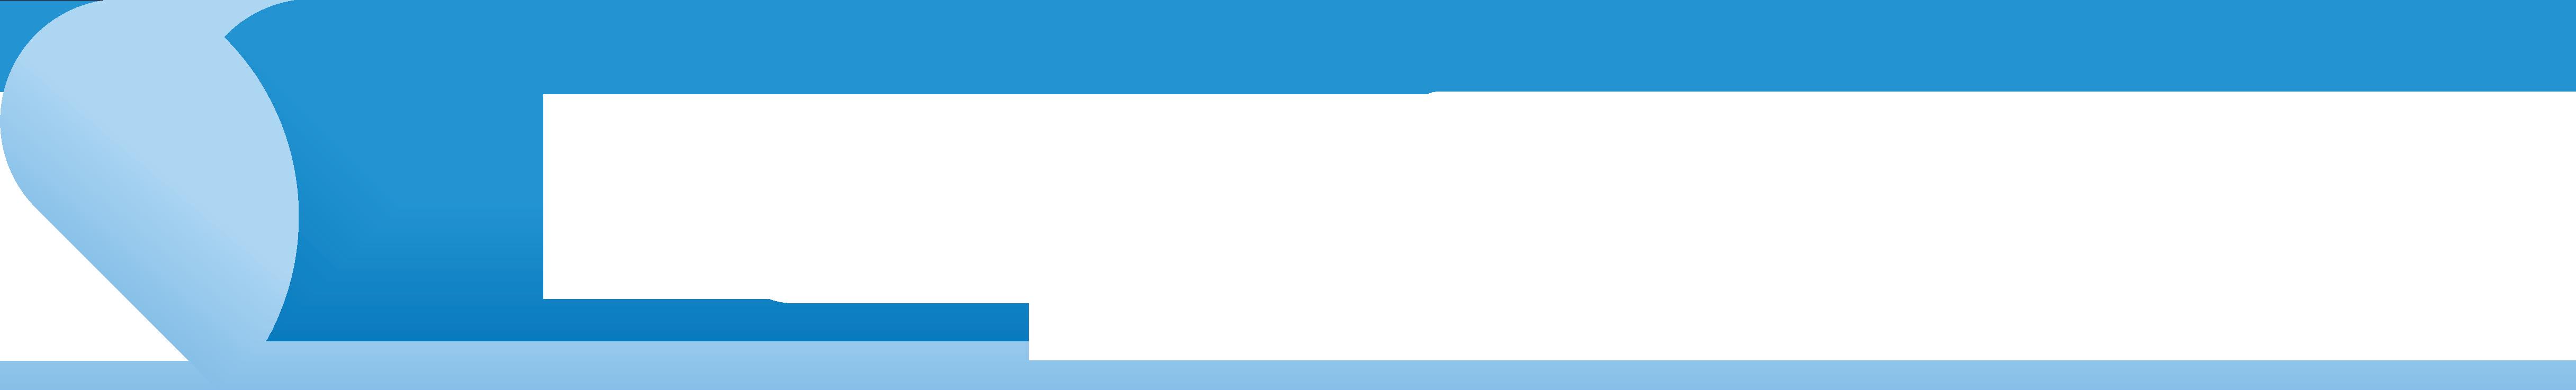 DeepMind Health 2